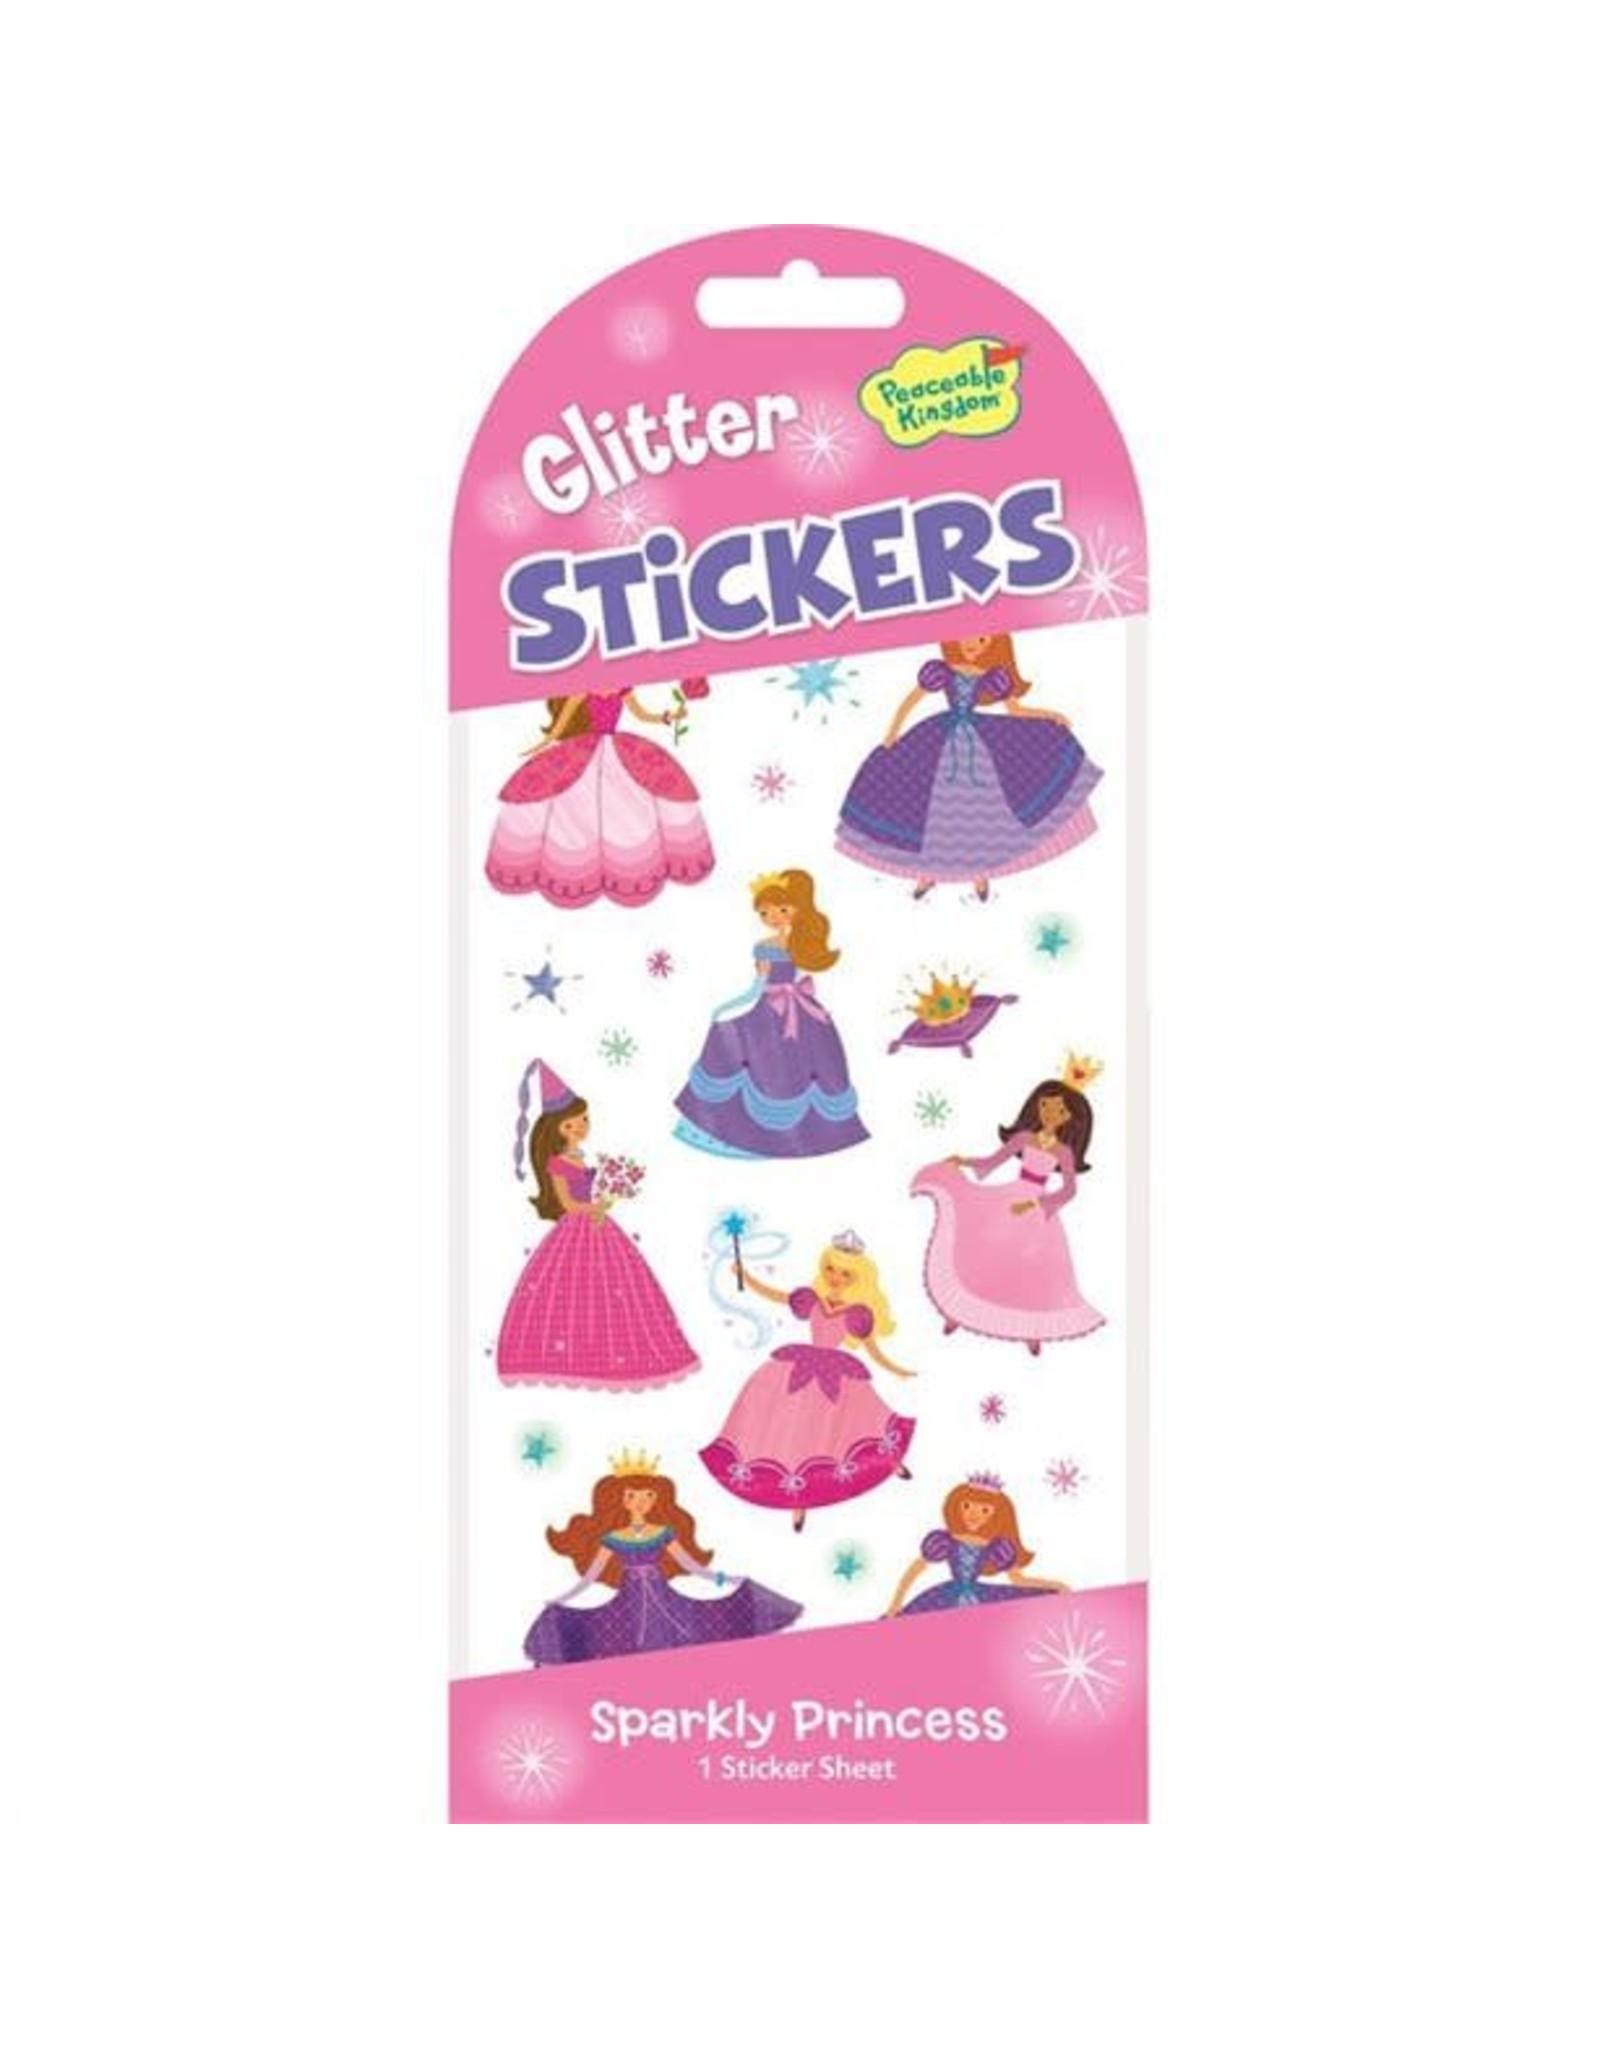 Peaceable Kingdom Sparkly Princess Glitter Stickers